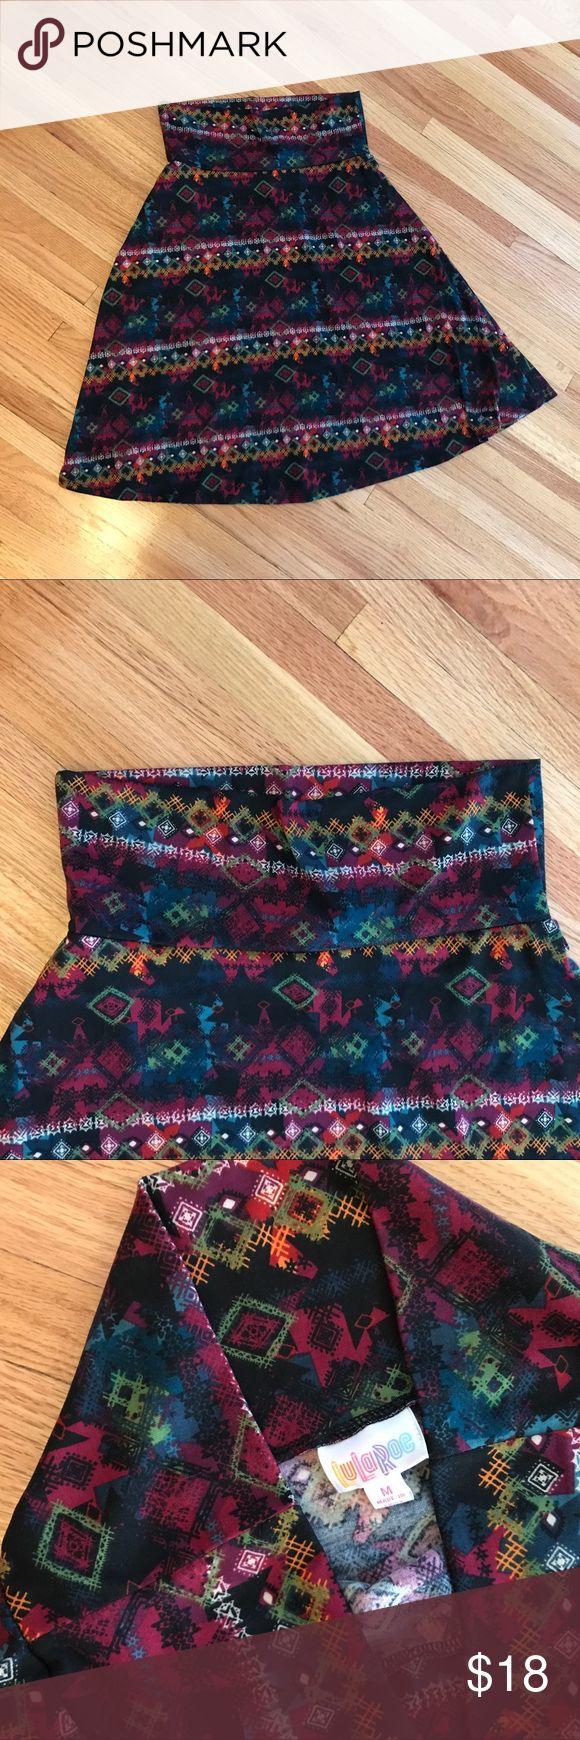 LuLaRoe size medium Aztec print skirt Size medium. Great used condition. Fun print. LuLaRoe Skirts